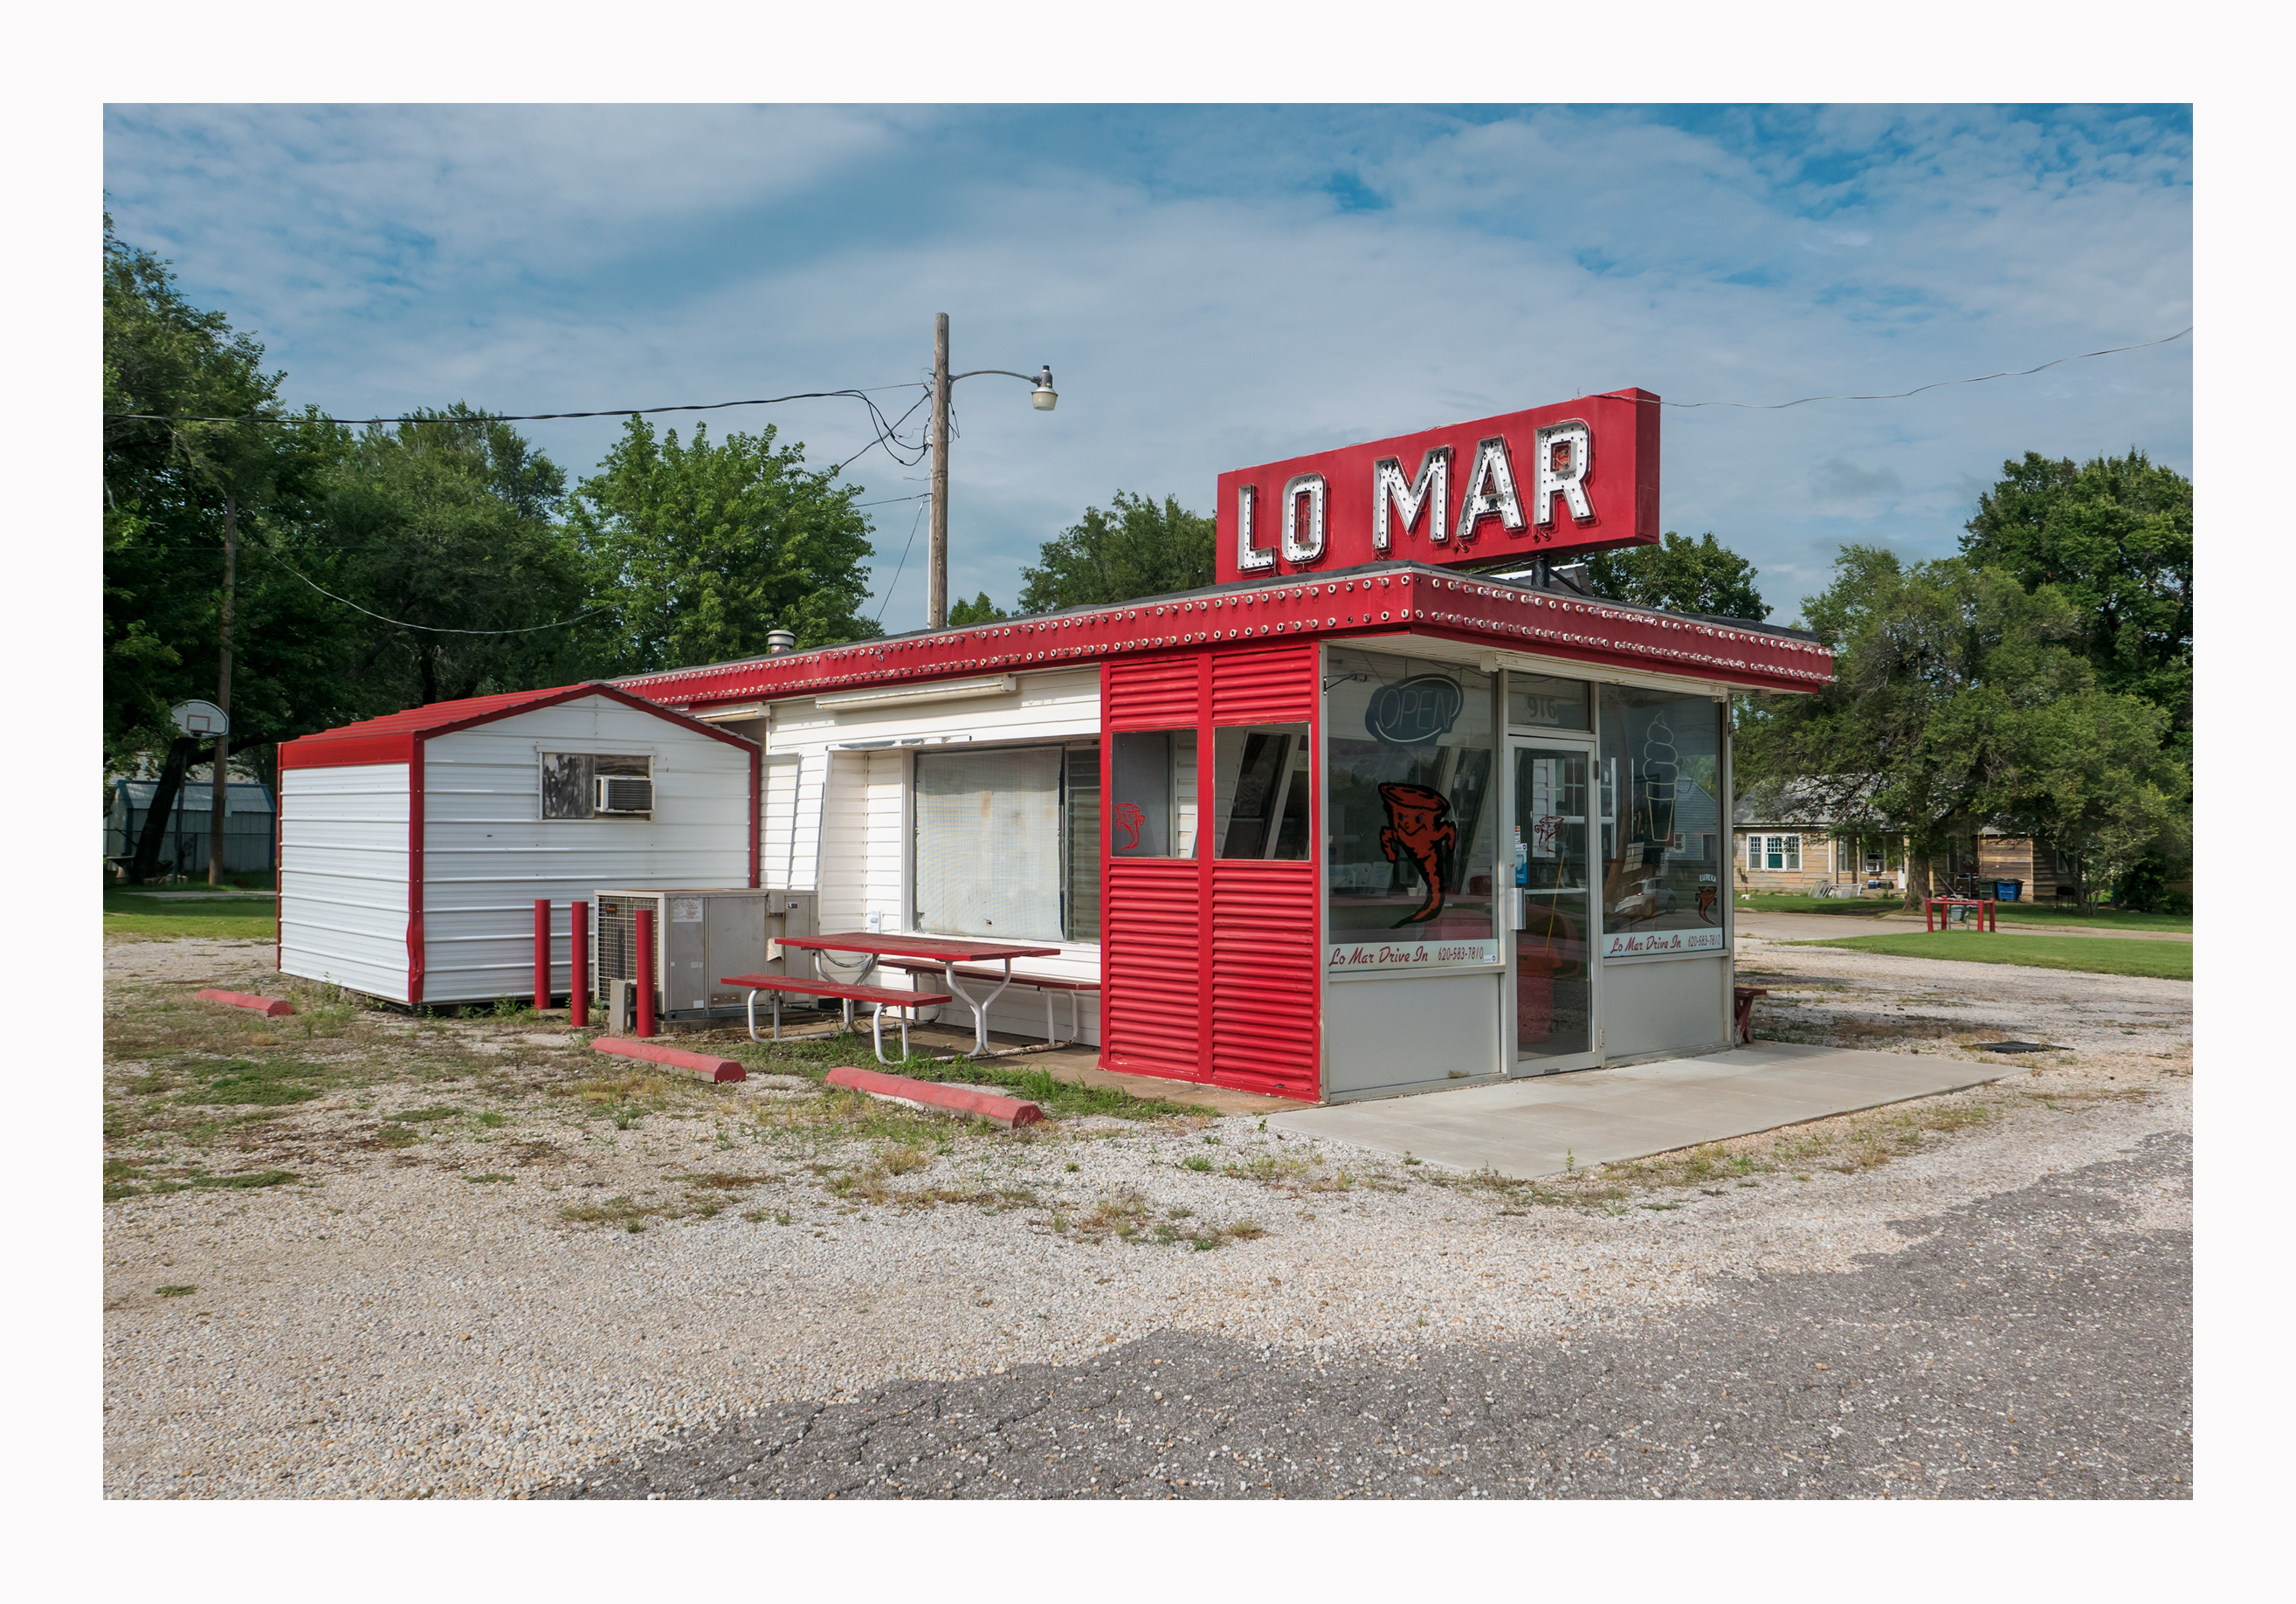 Lo Mar Drive In - 916 East River Street, Eureka, Kansas U.S.A. - July 25, 2016